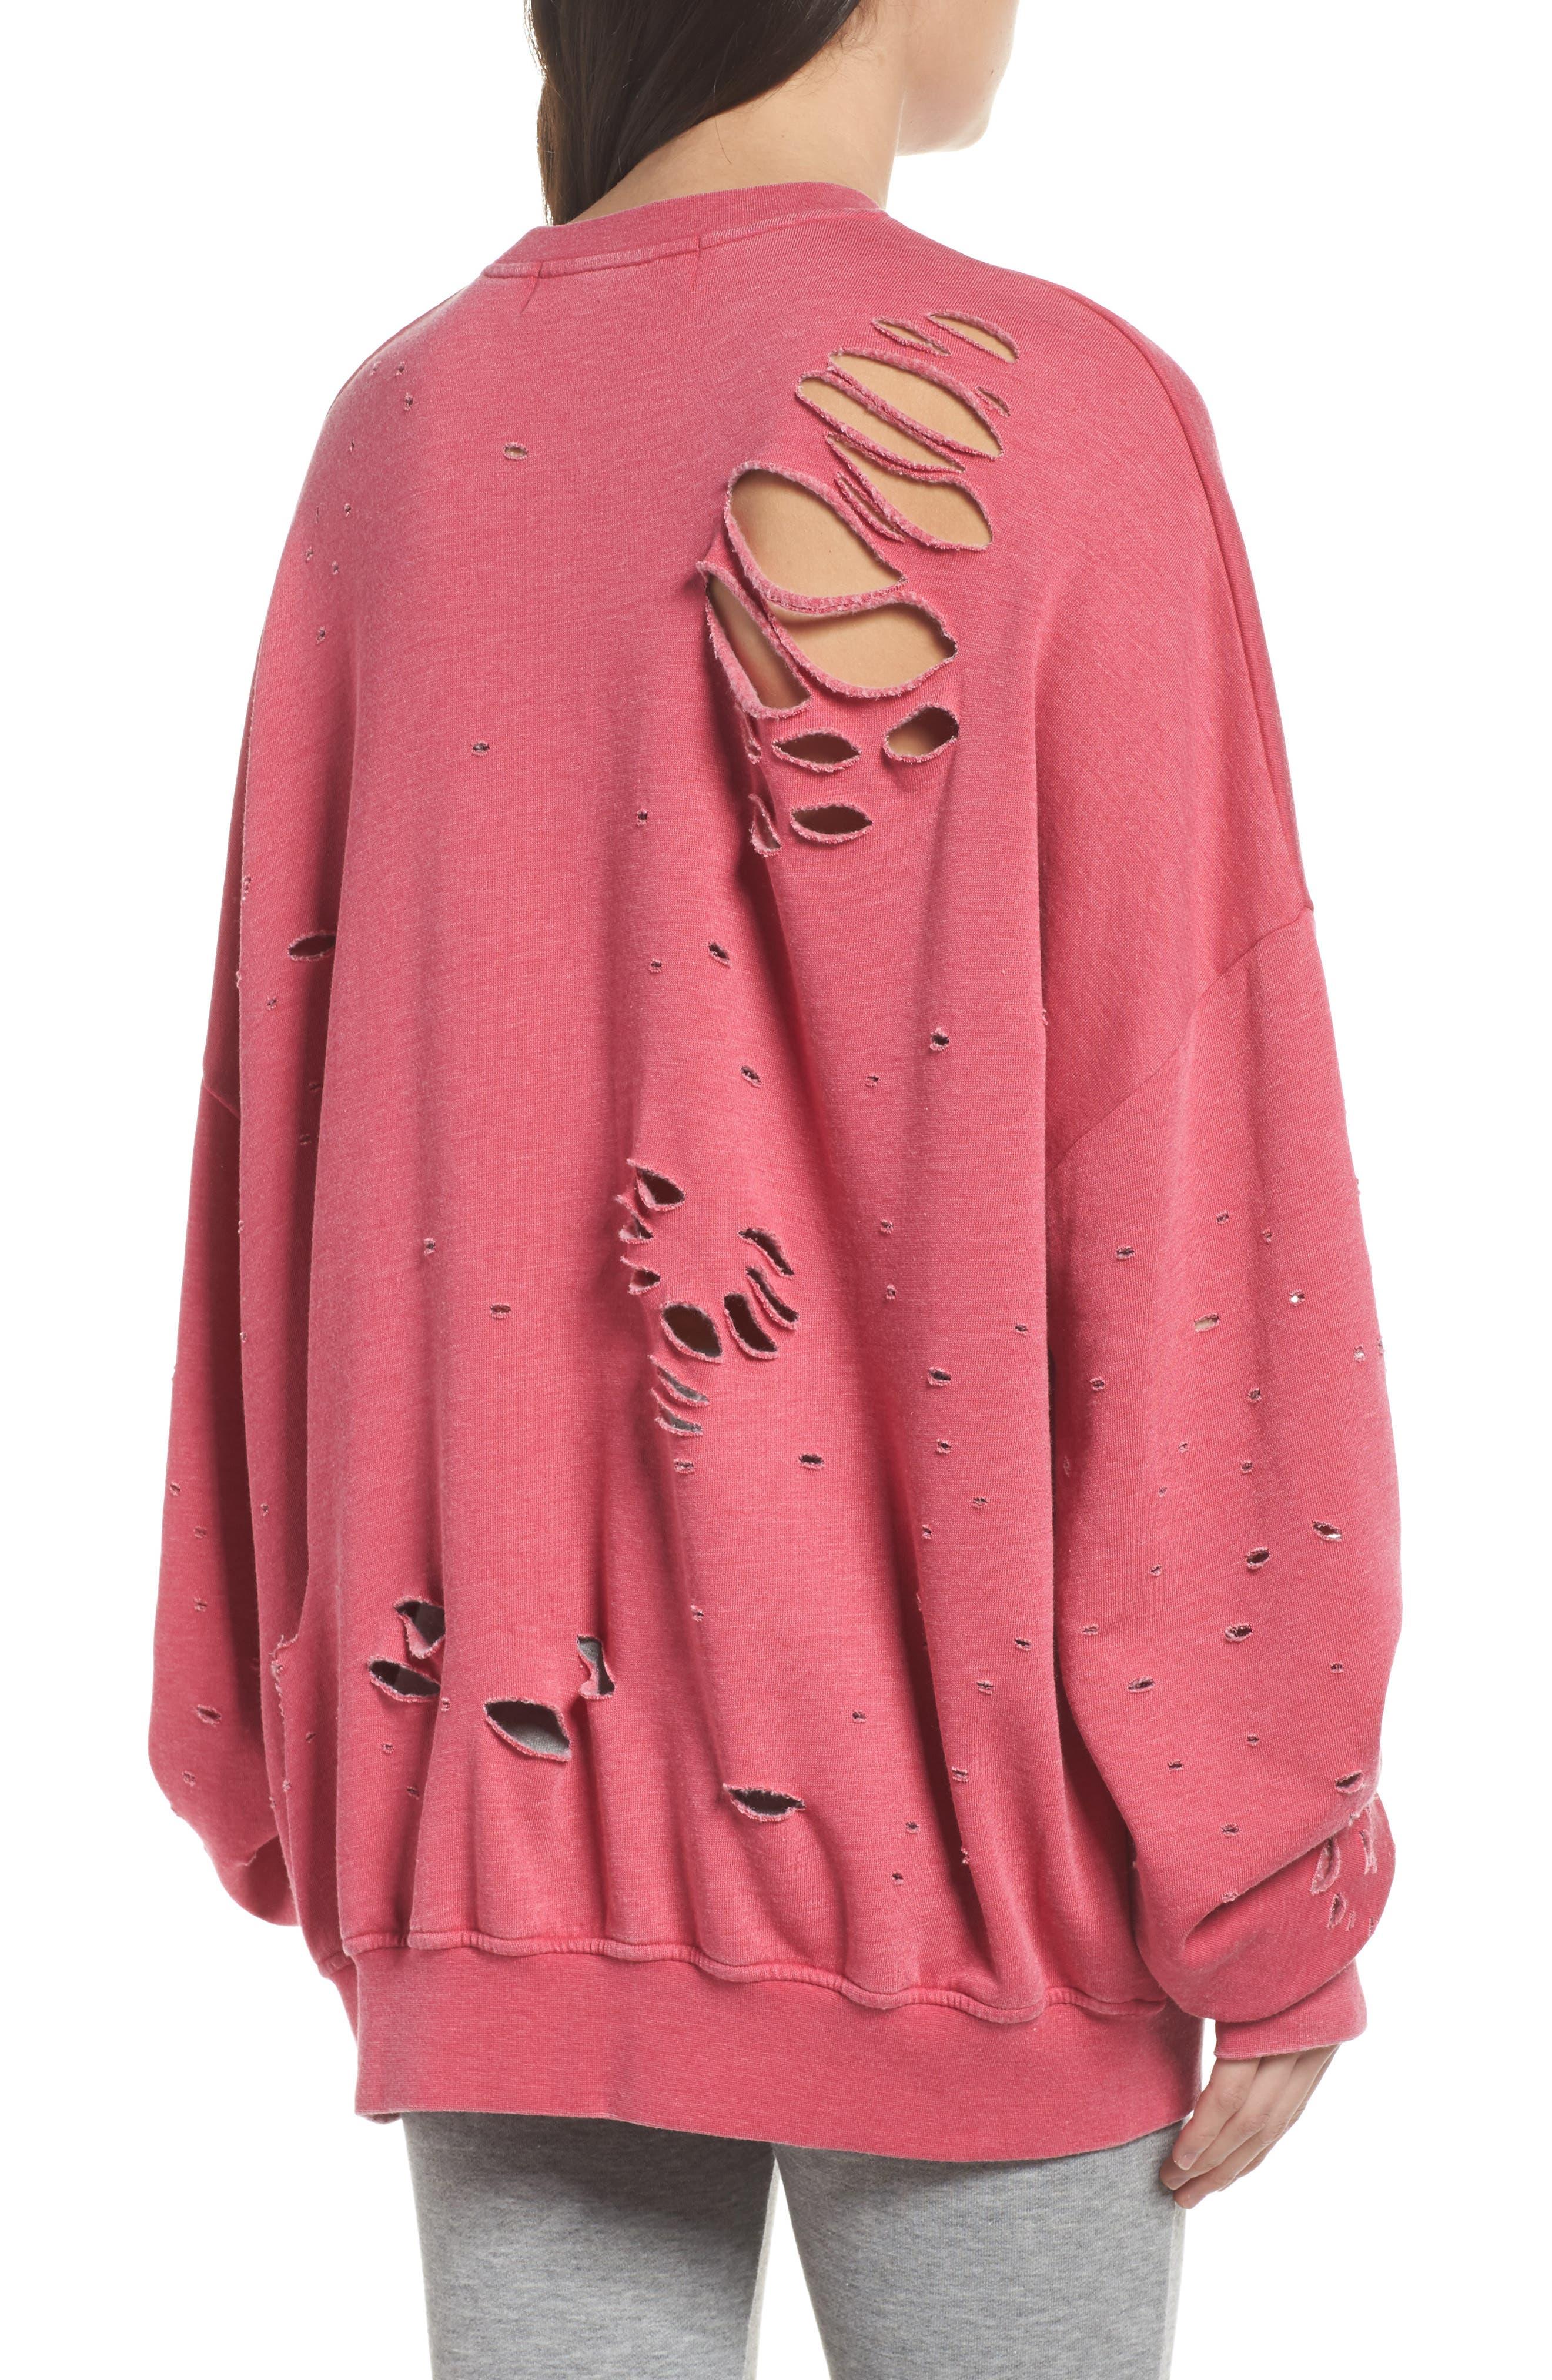 Thrasher Sweatshirt,                             Alternate thumbnail 2, color,                             Flamingo